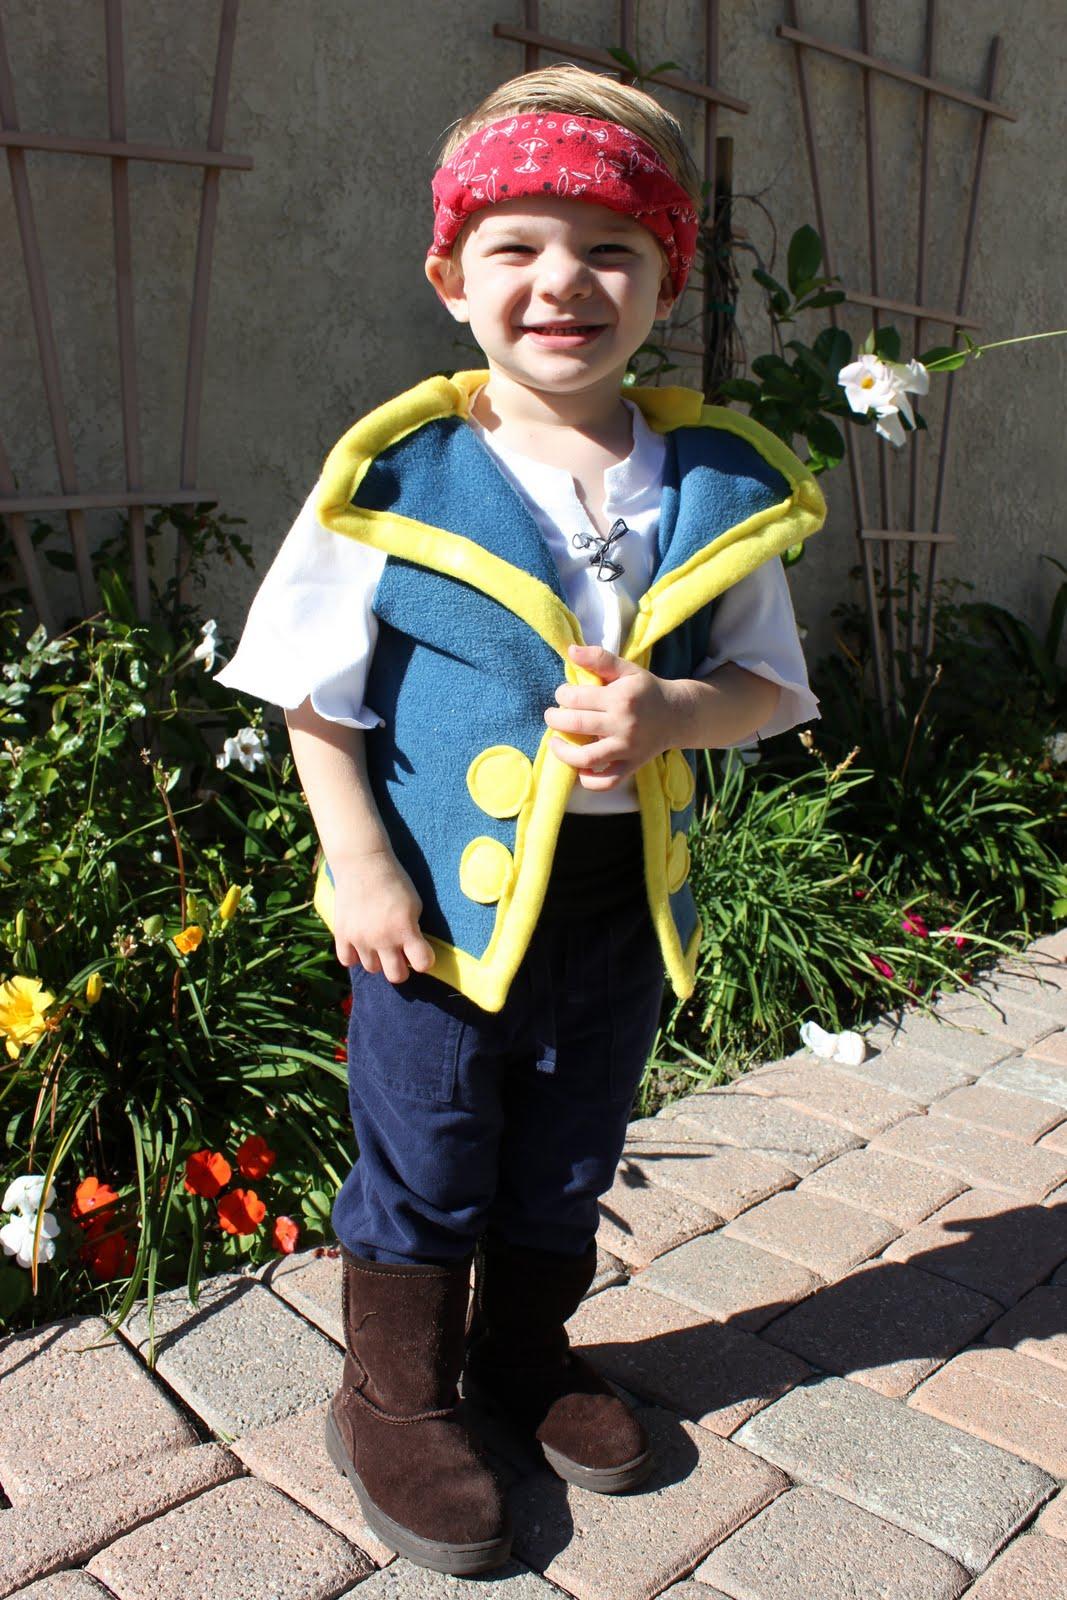 Lu Bird Baby: Jake from Jake and the Neverland Pirates ...